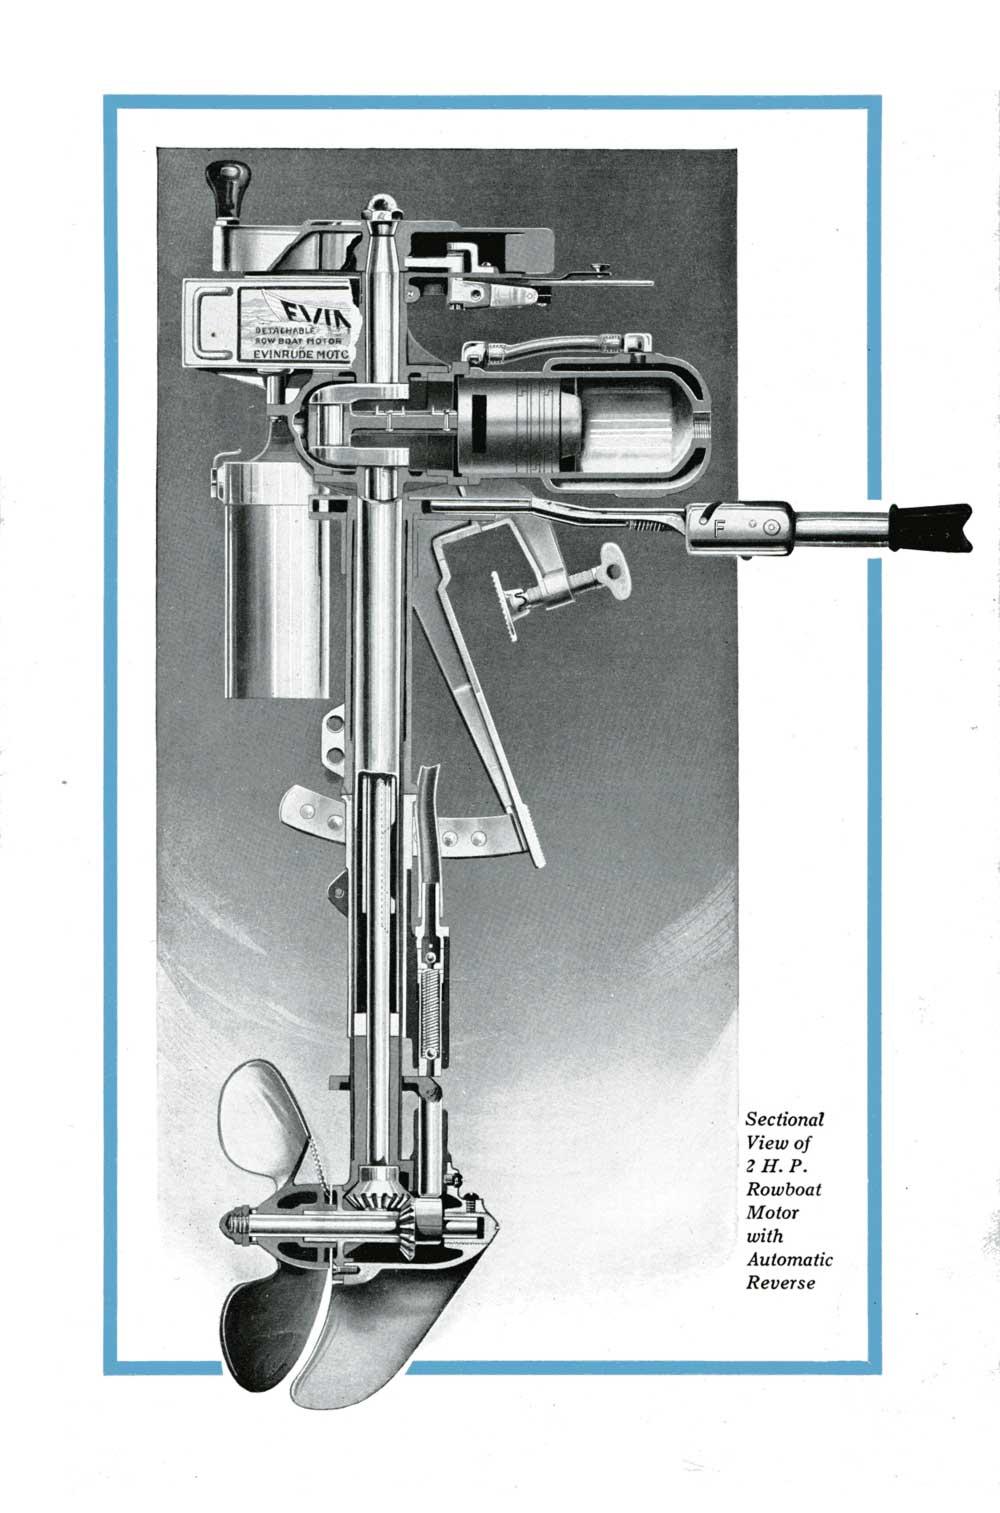 1919 Evinrude Sales Brochure